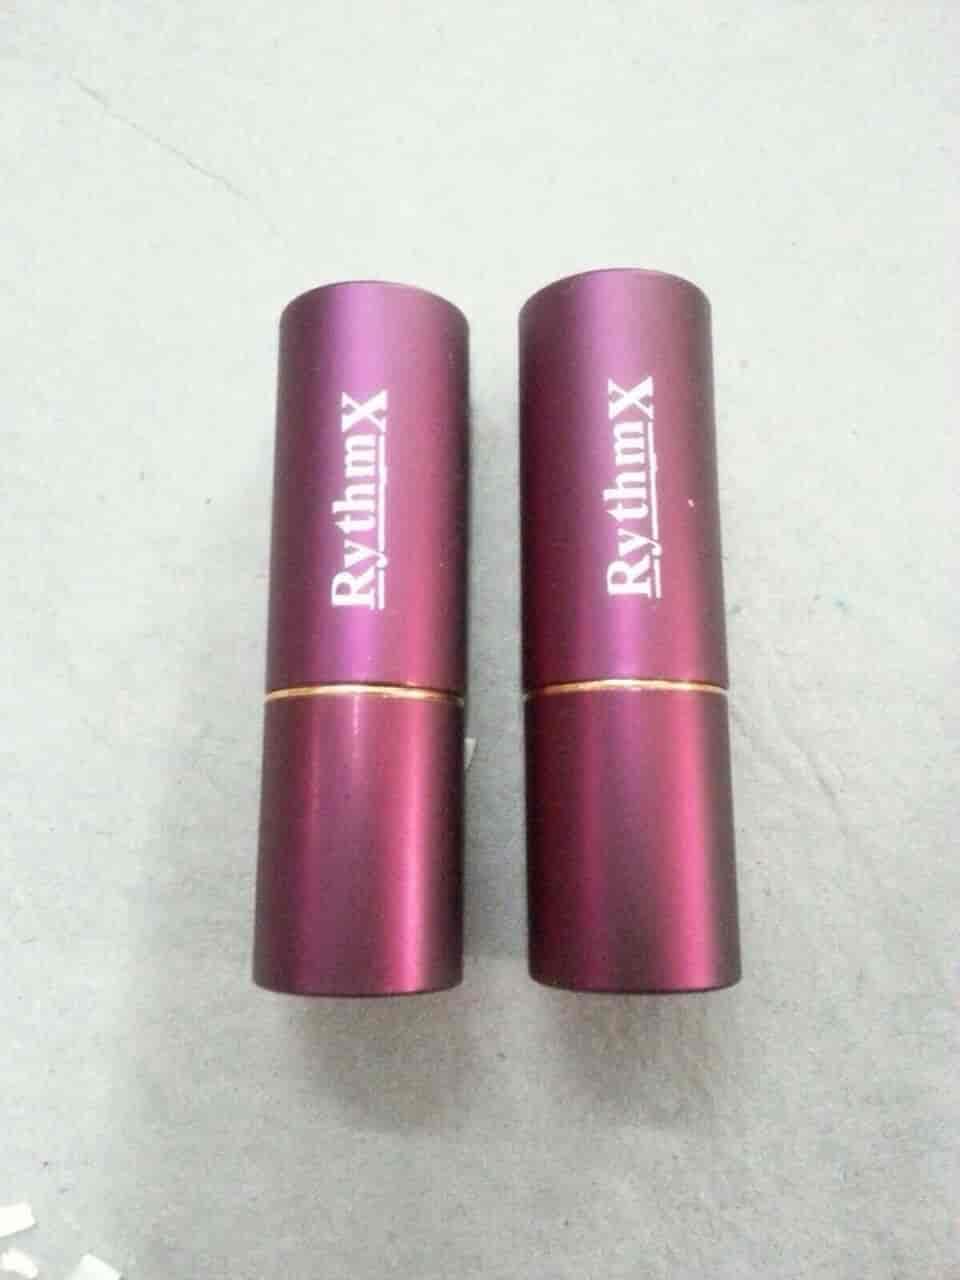 Rythmx Cosmetic Formulations, Basant Avenue - Cosmetic